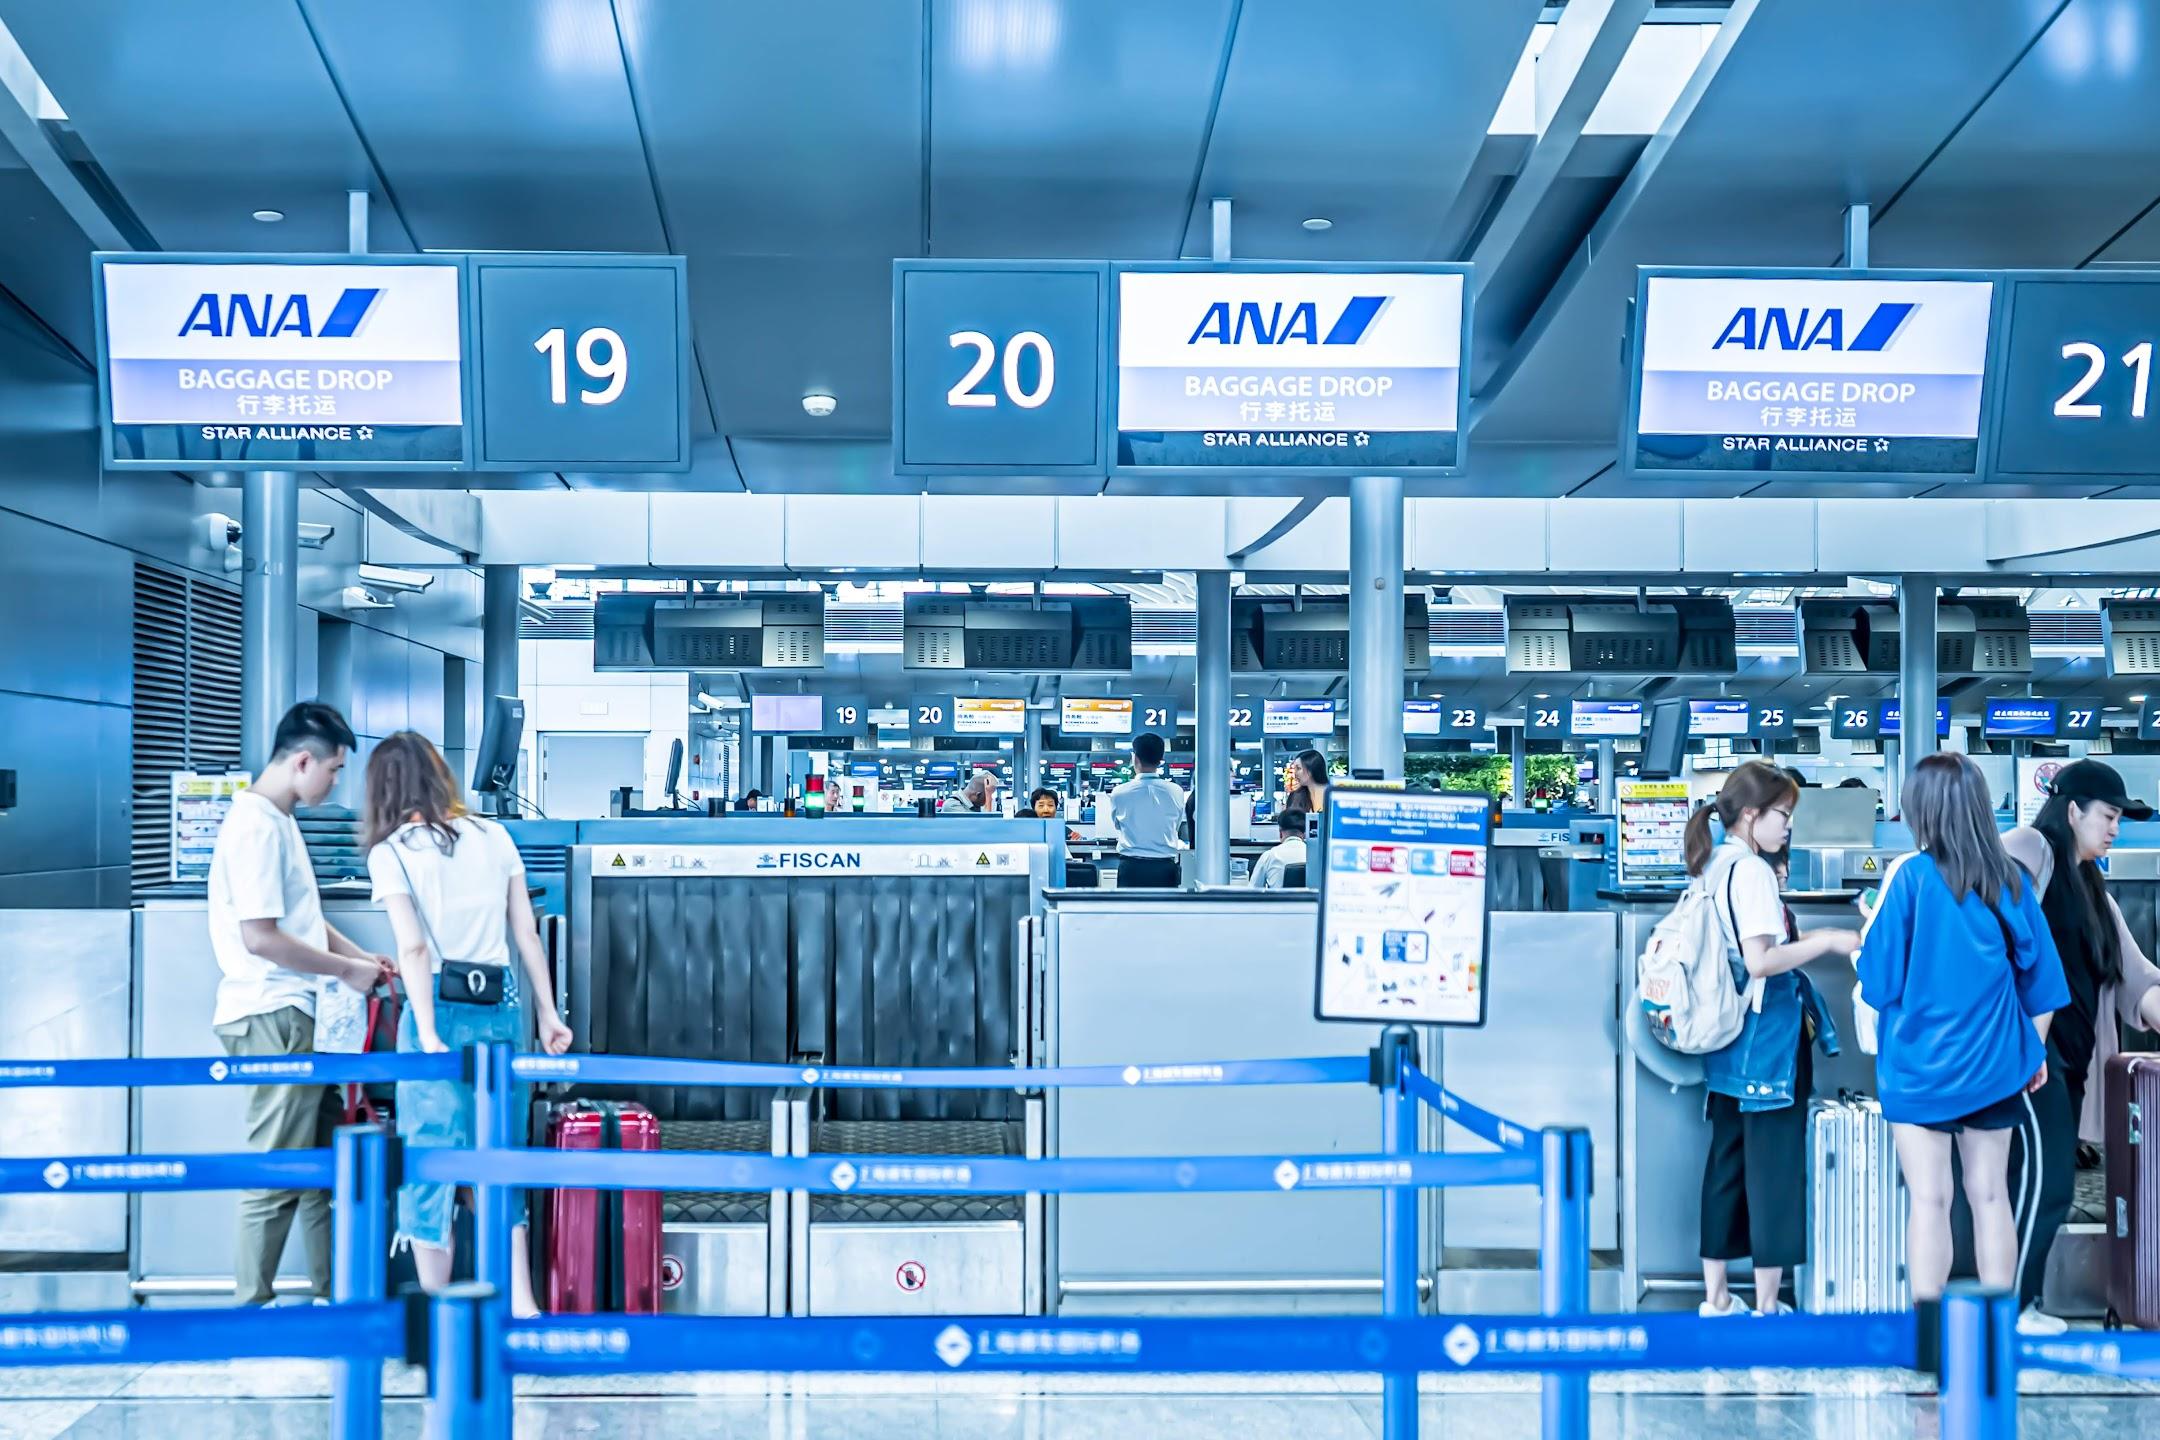 Shanghai Pudong International Airport ANA2